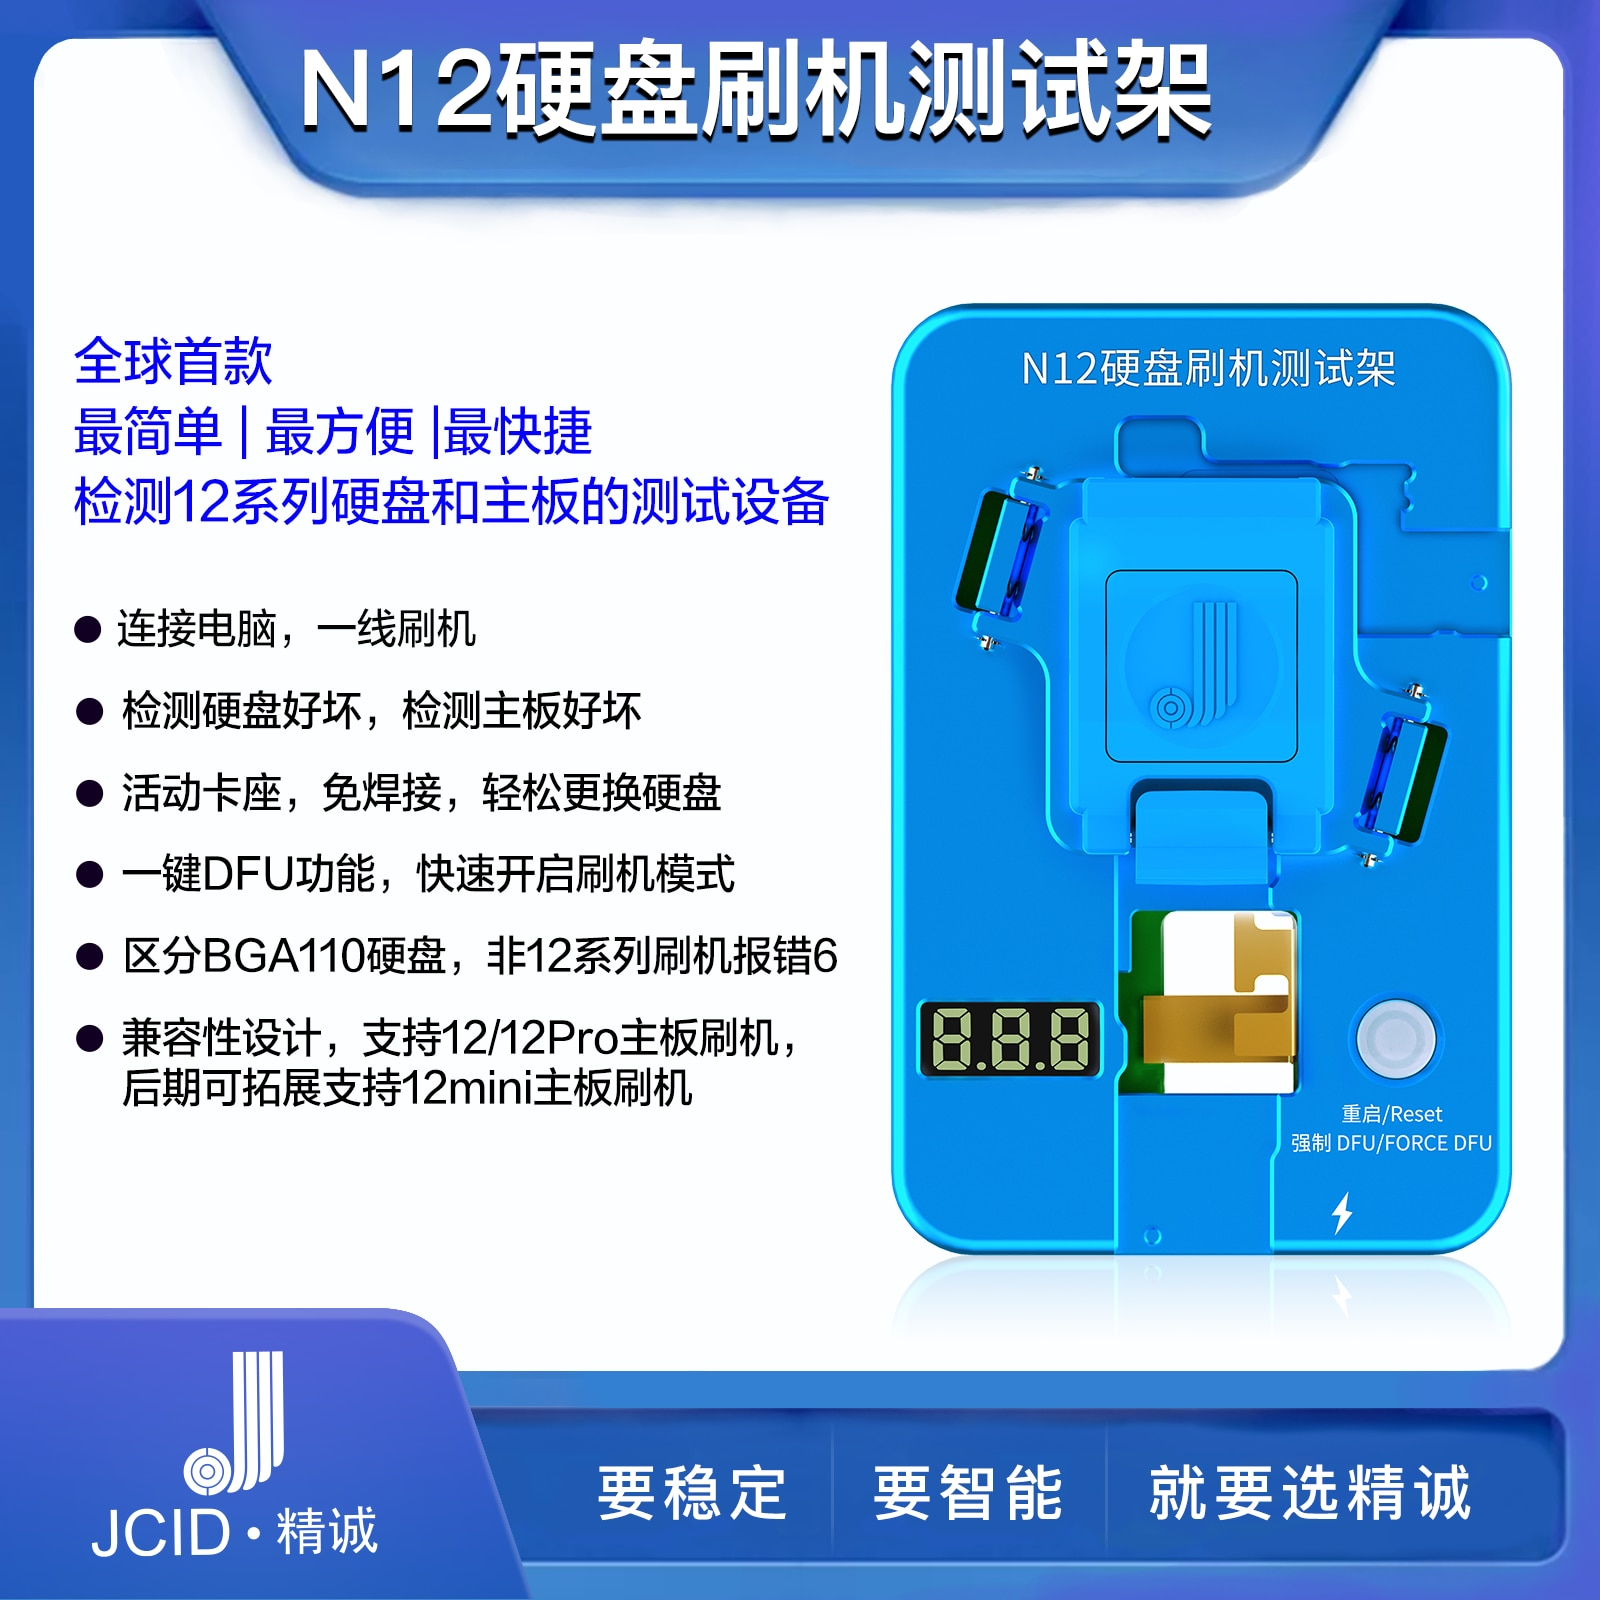 JC N12 القرص الصلب وامض استعادة تستر NAND مبرمج آيفون 12 سلسلة اللوحة إصلاح مفتاح واحد DFU